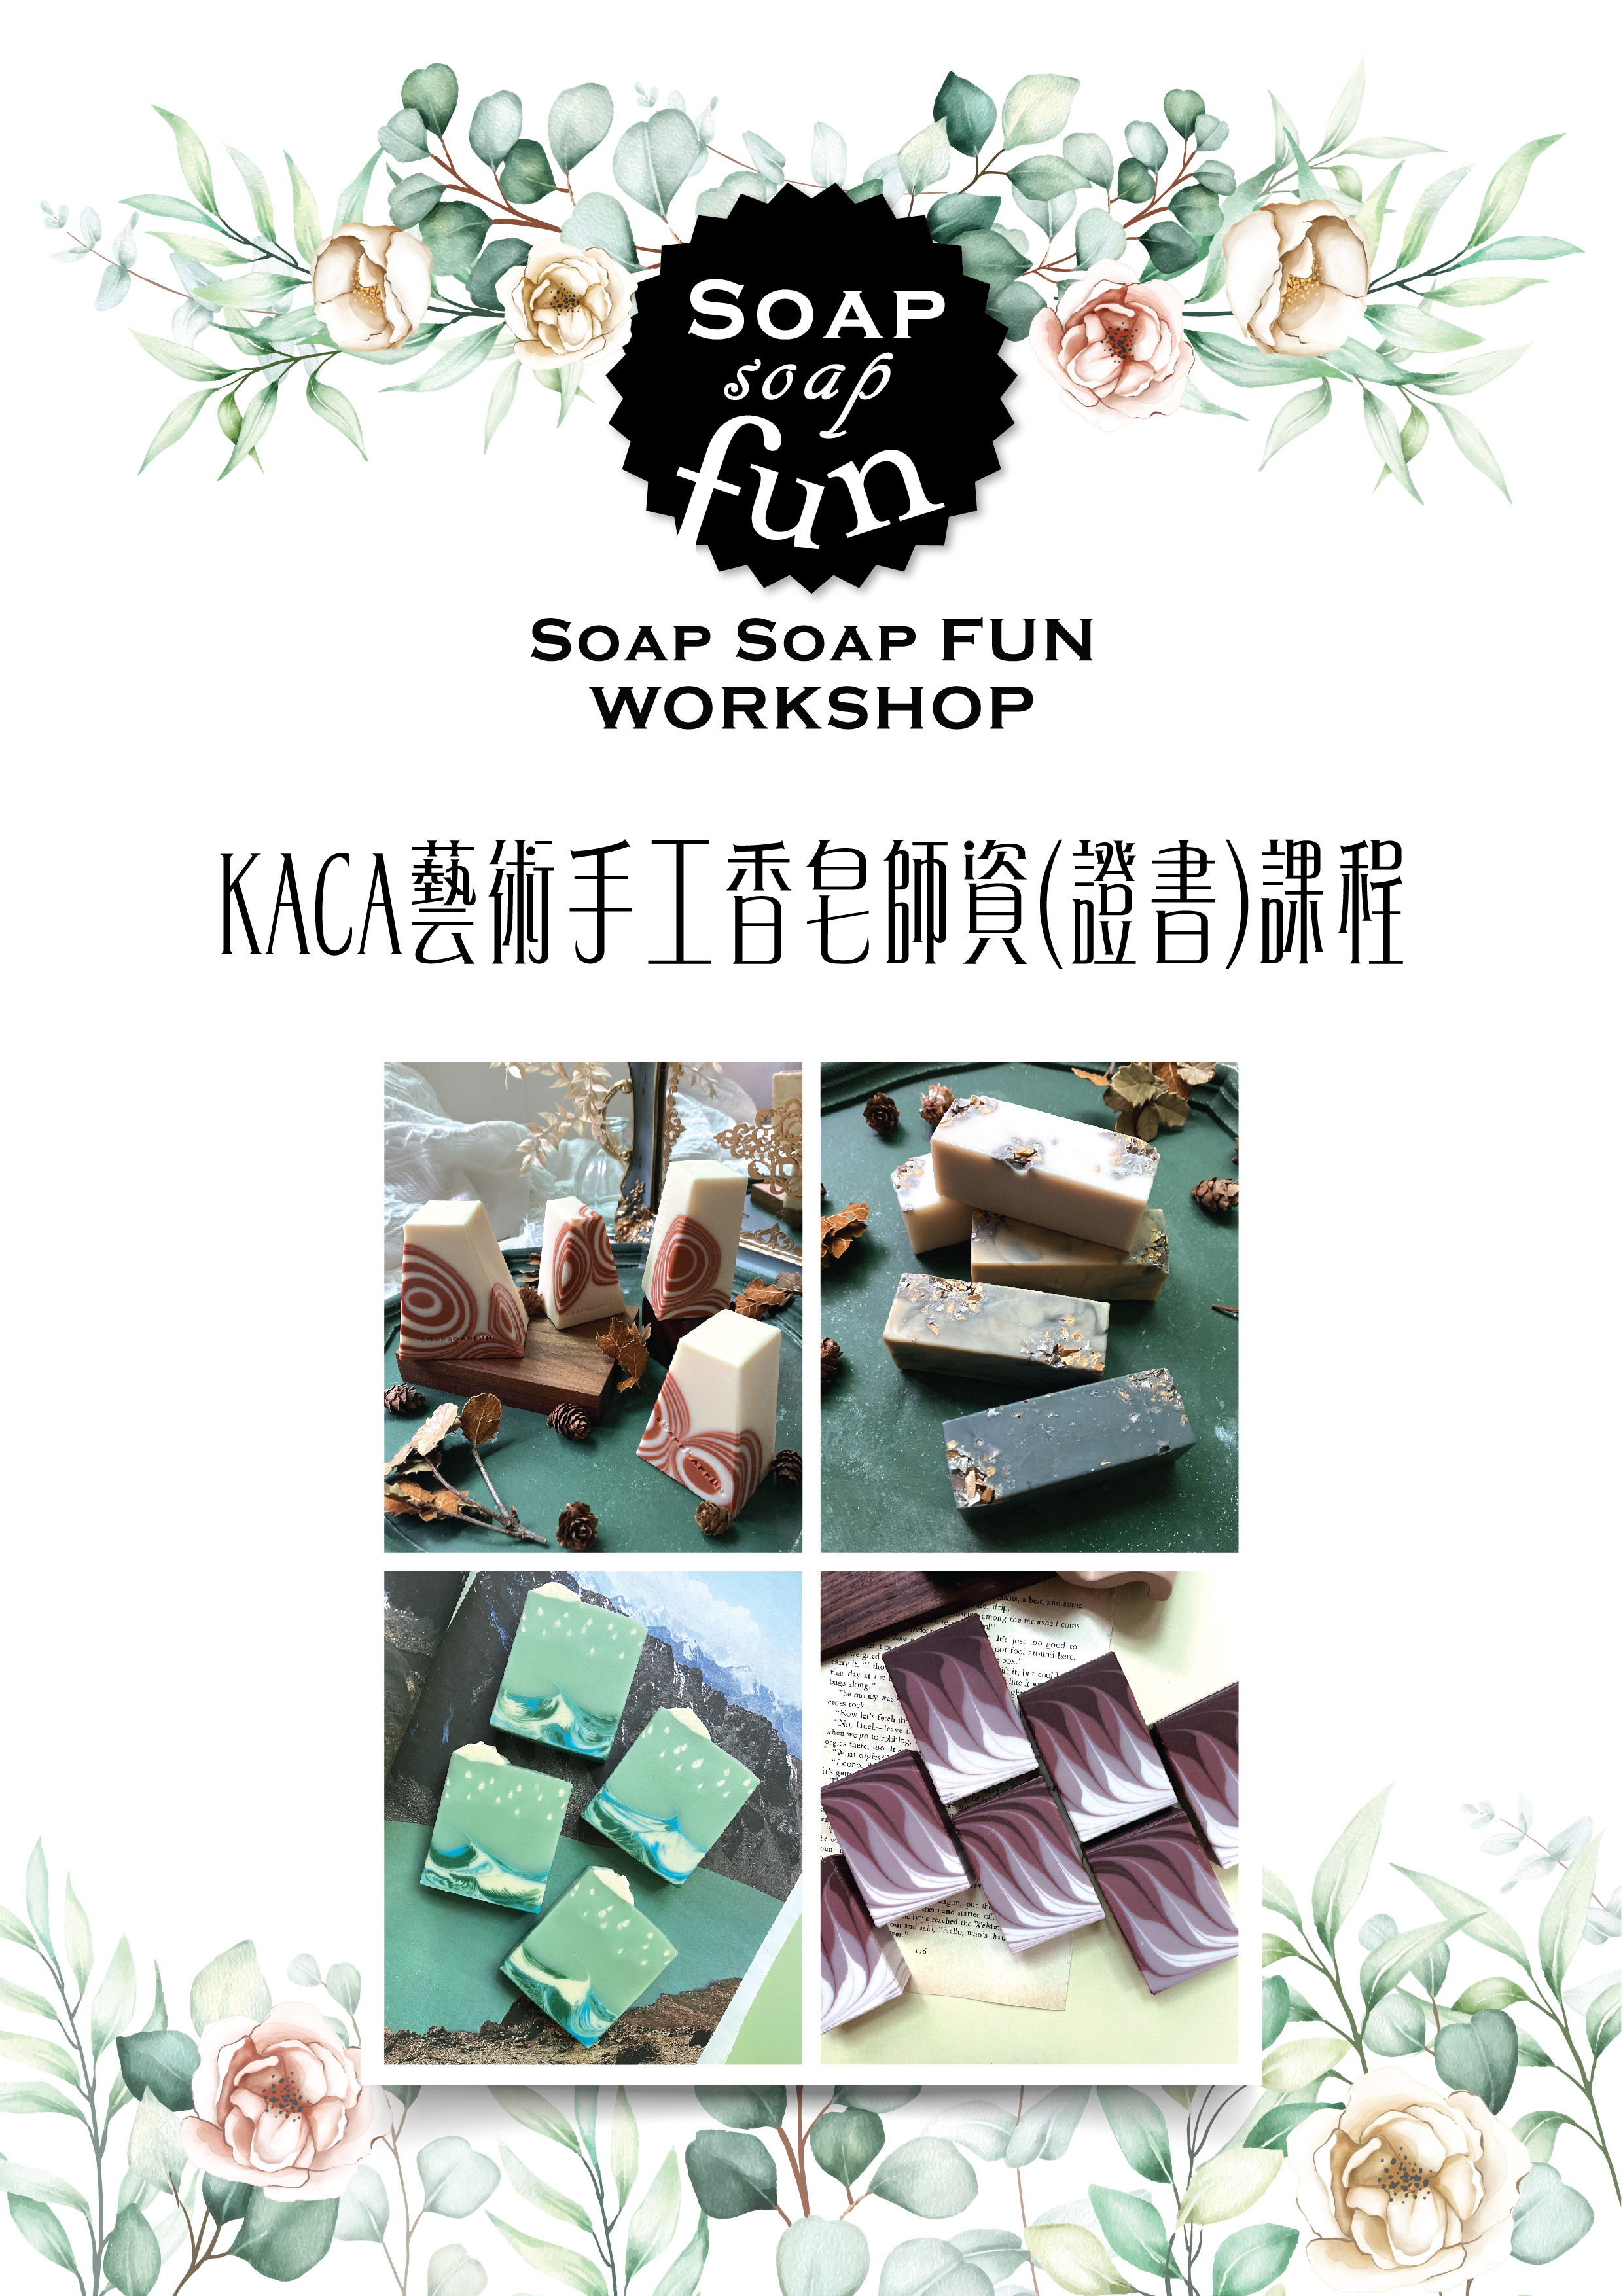 KACA CP Soap Master class 藝術手工香皂師資(證書)課程(三天)